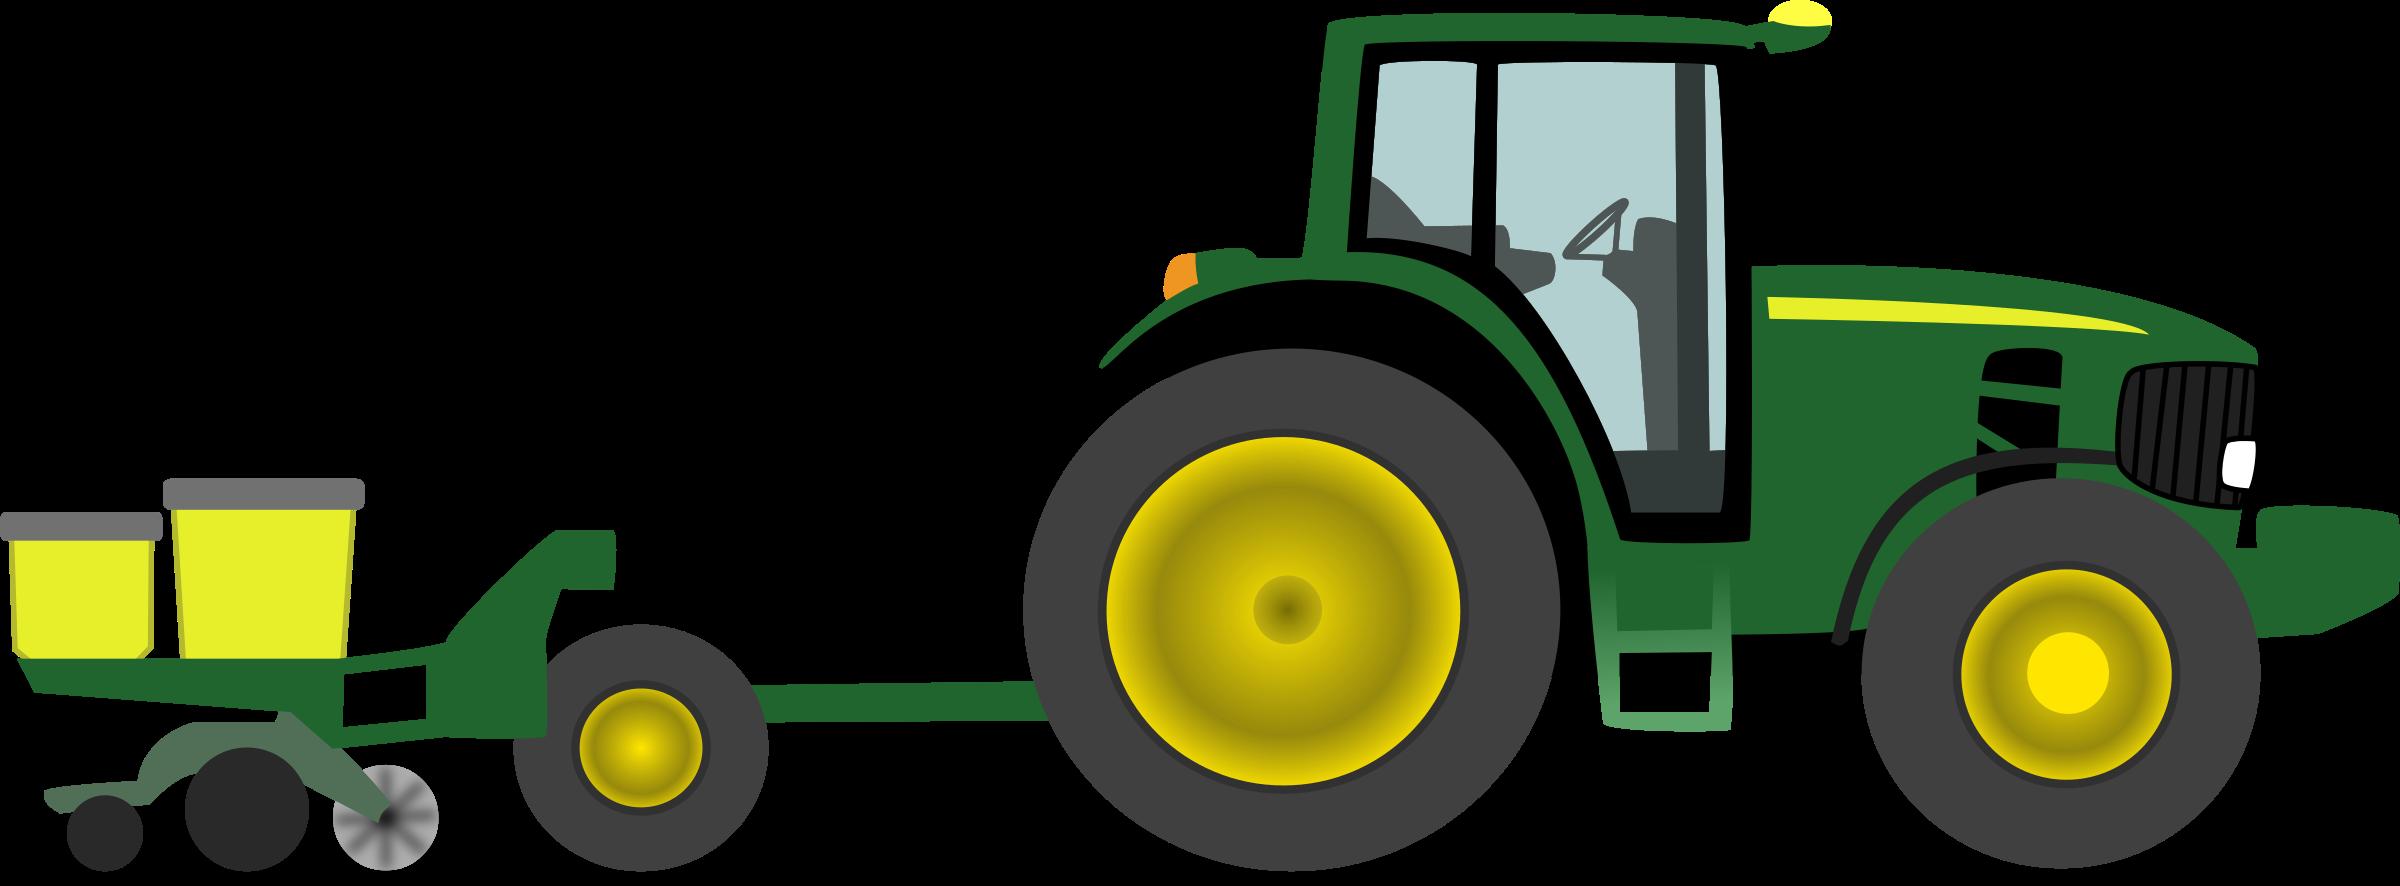 Clip Art John Deere Clipart john deere tractor clip art clipart best tumundografico